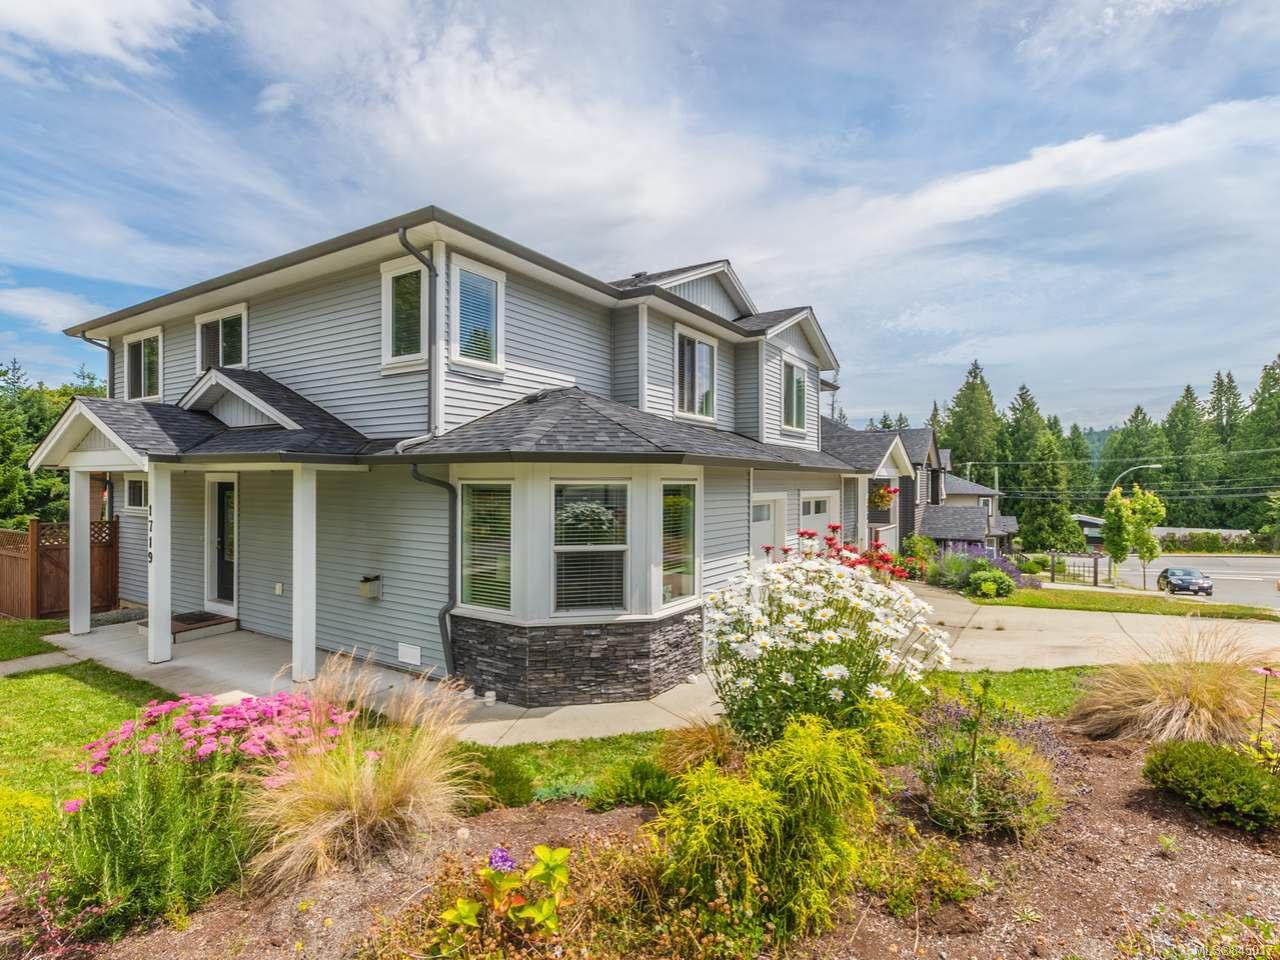 Main Photo: 1719 Trevors Rd in NANAIMO: Na Chase River Half Duplex for sale (Nanaimo)  : MLS®# 845017